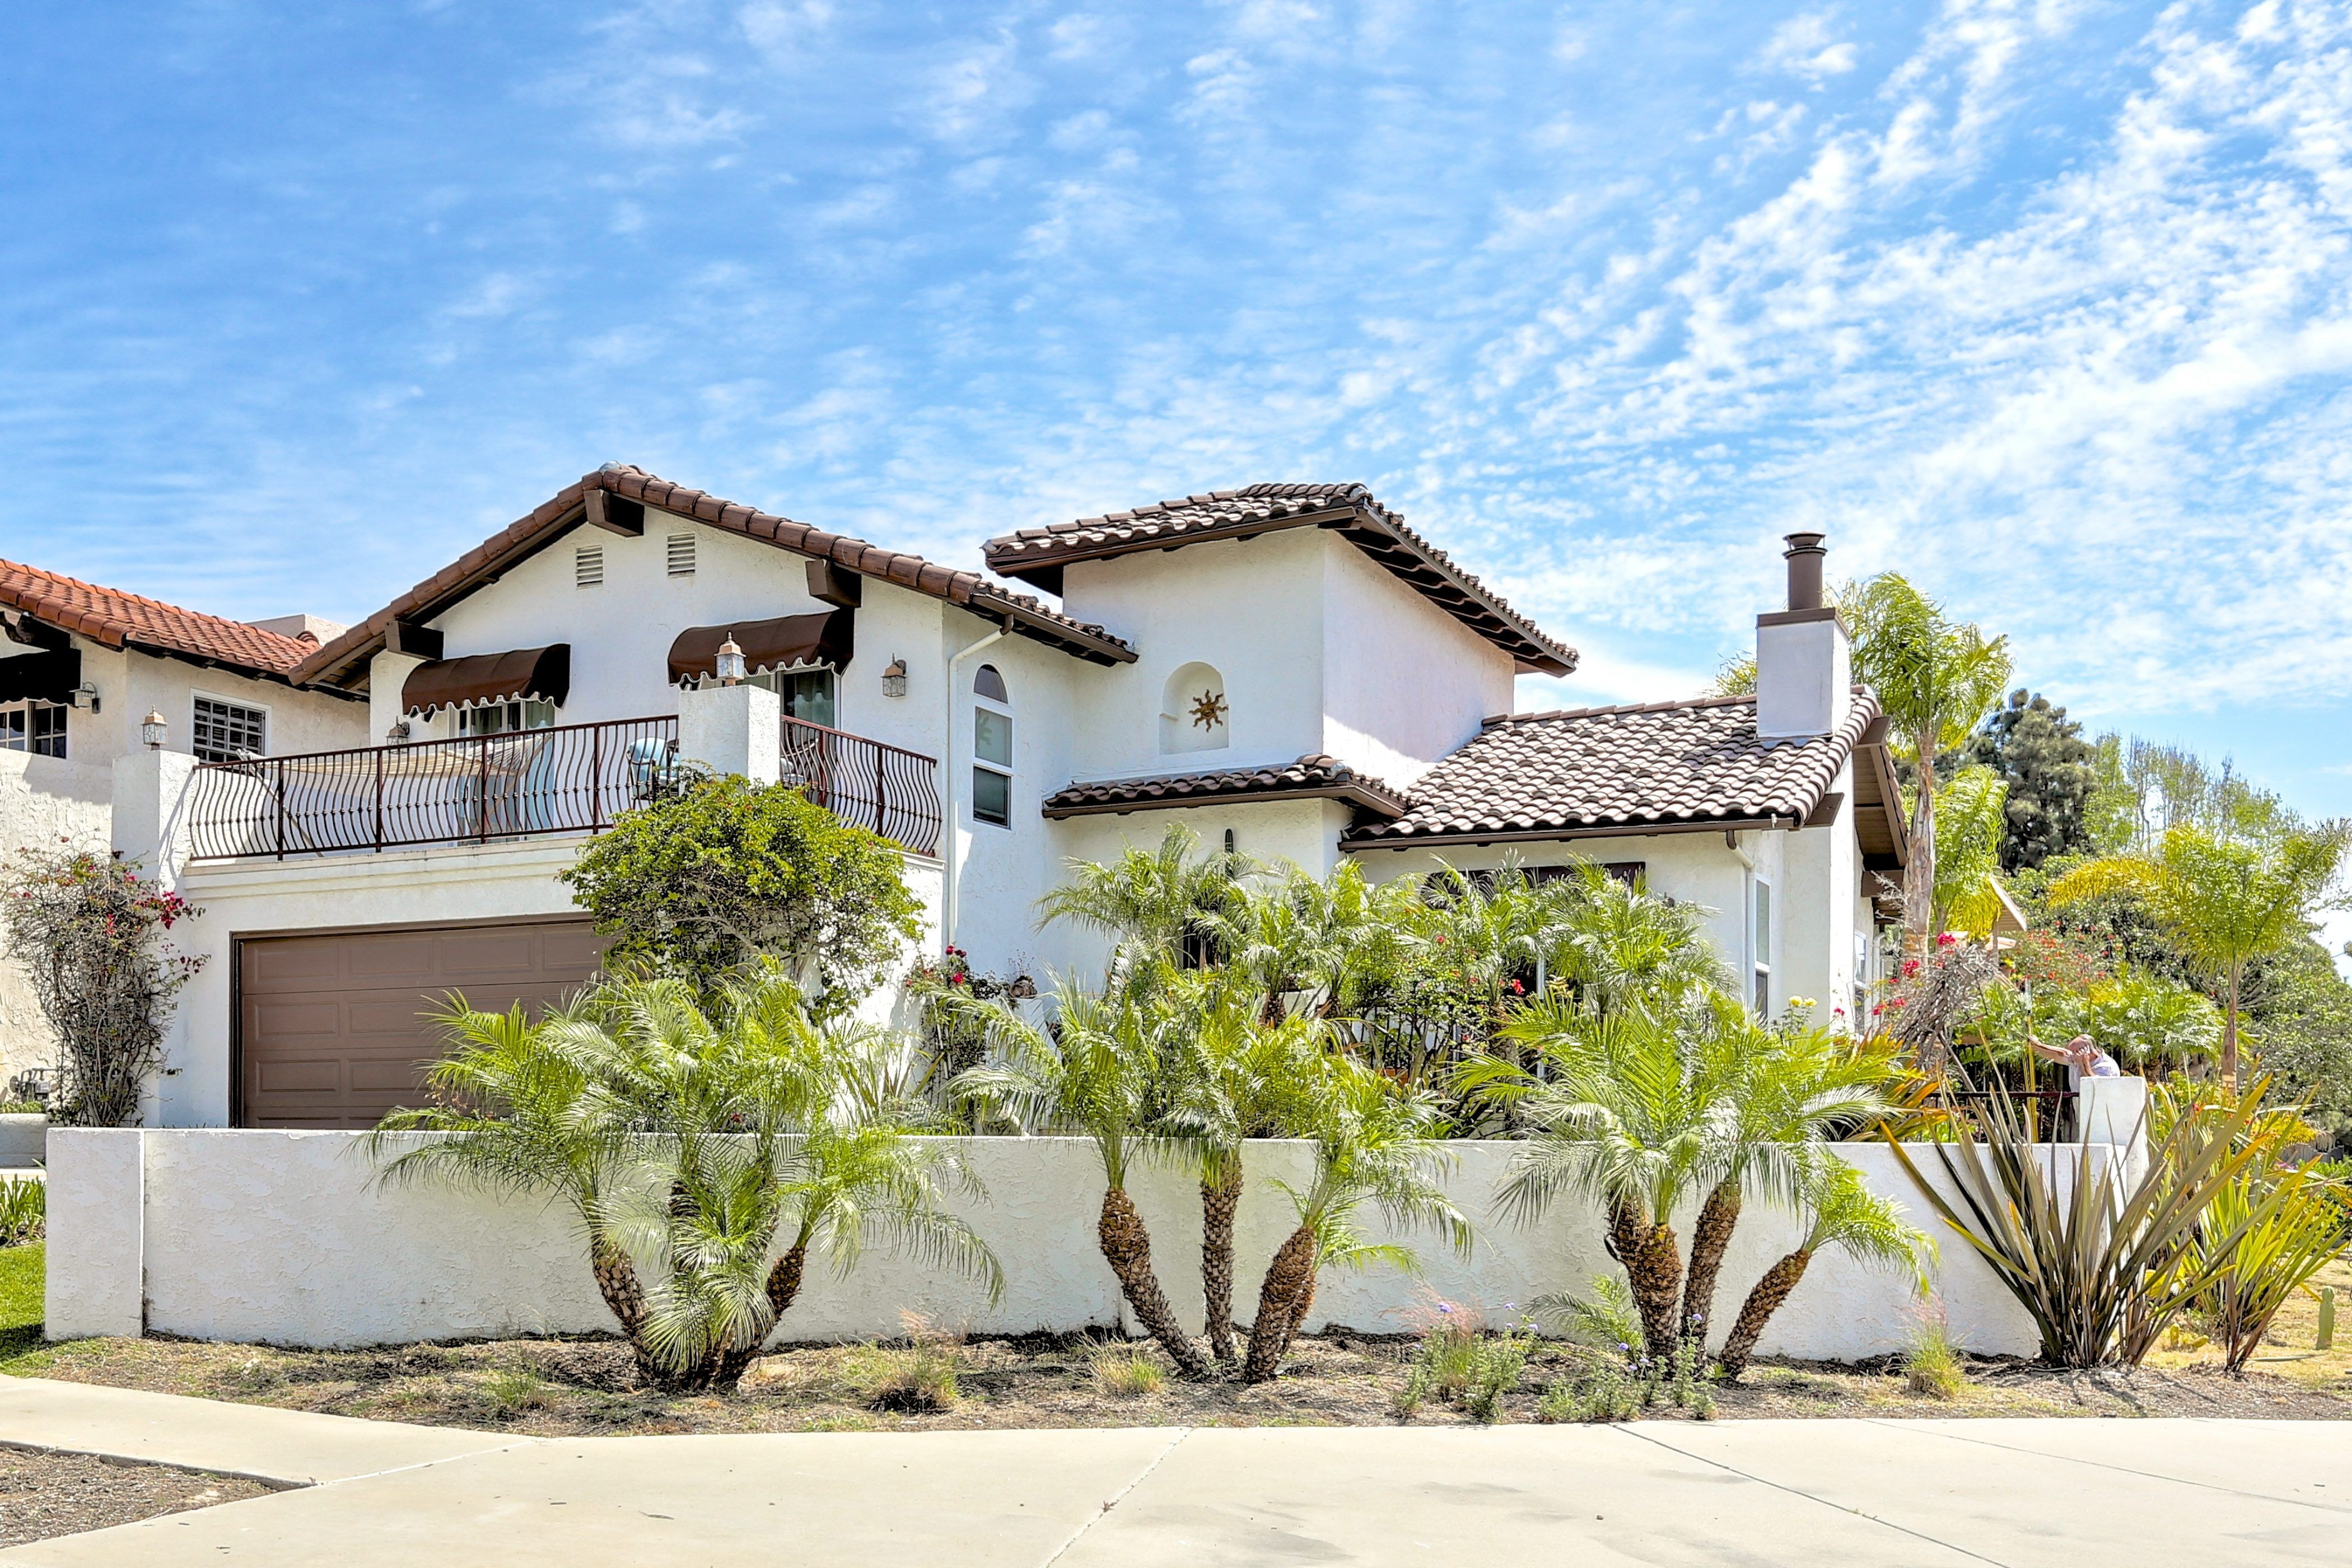 27036 Azul Drive, Dana Point Property Listing MLS®